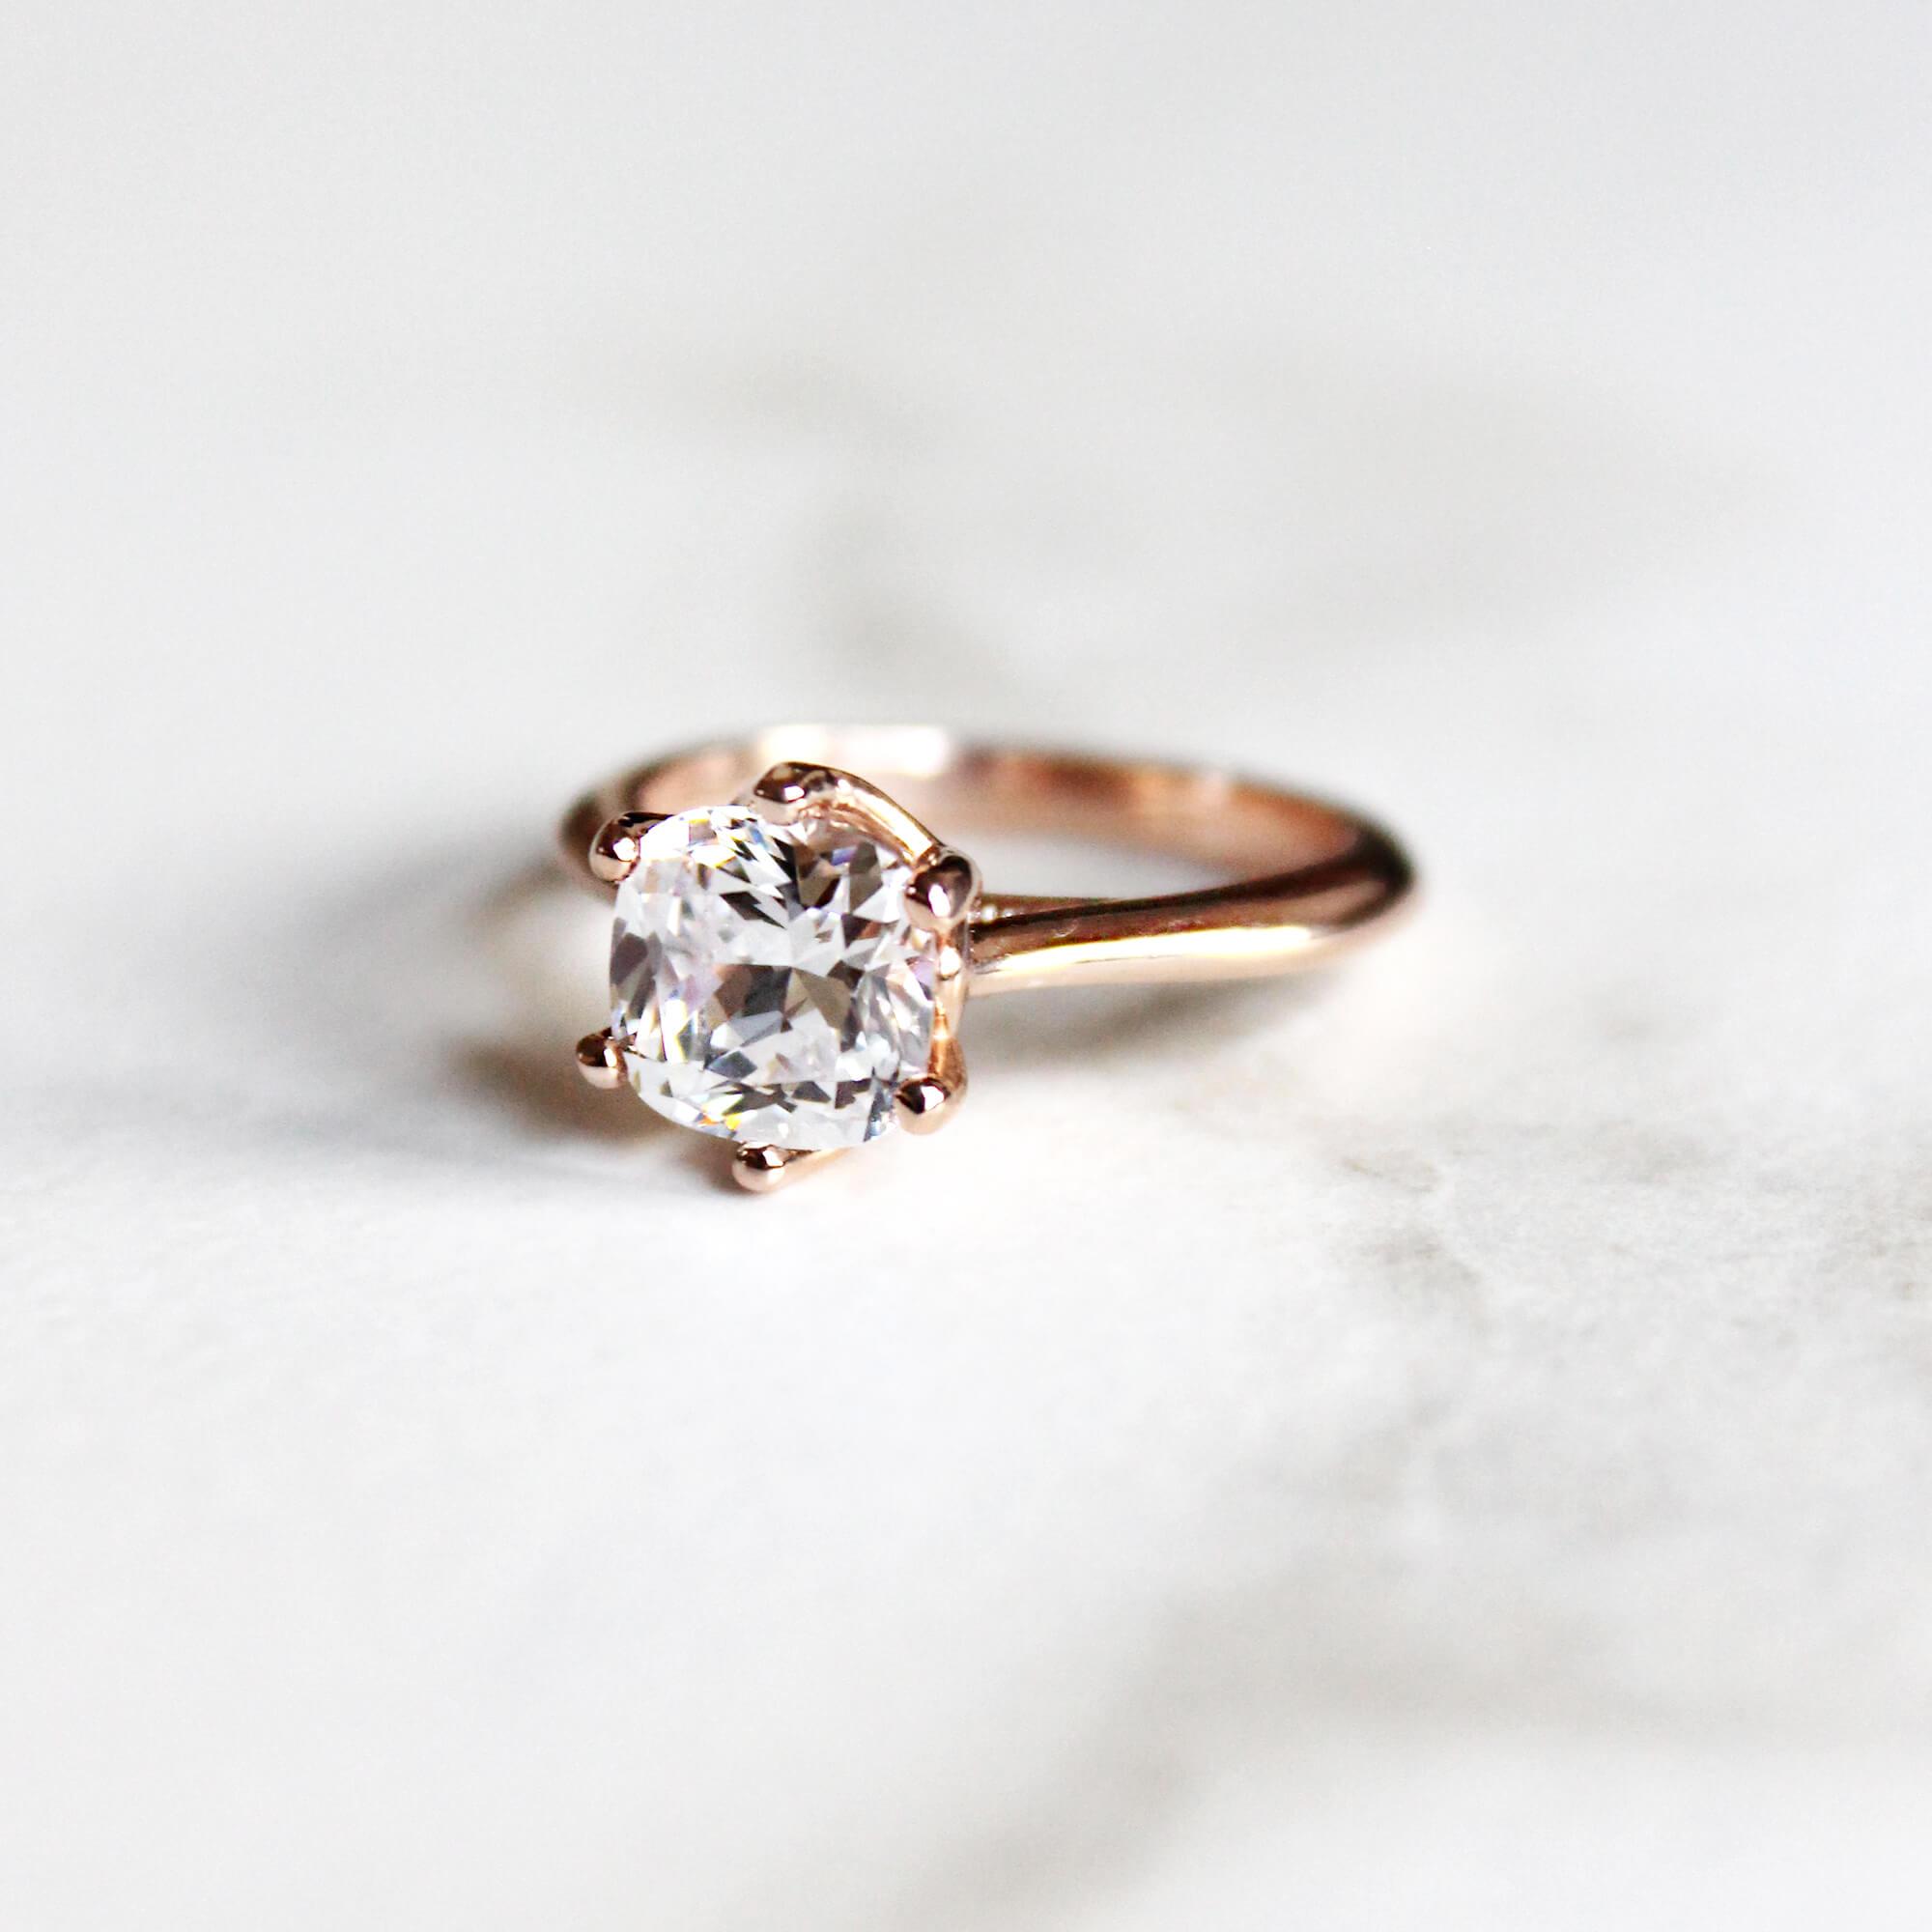 Bali Classic Cushion Cut Engagement Ring